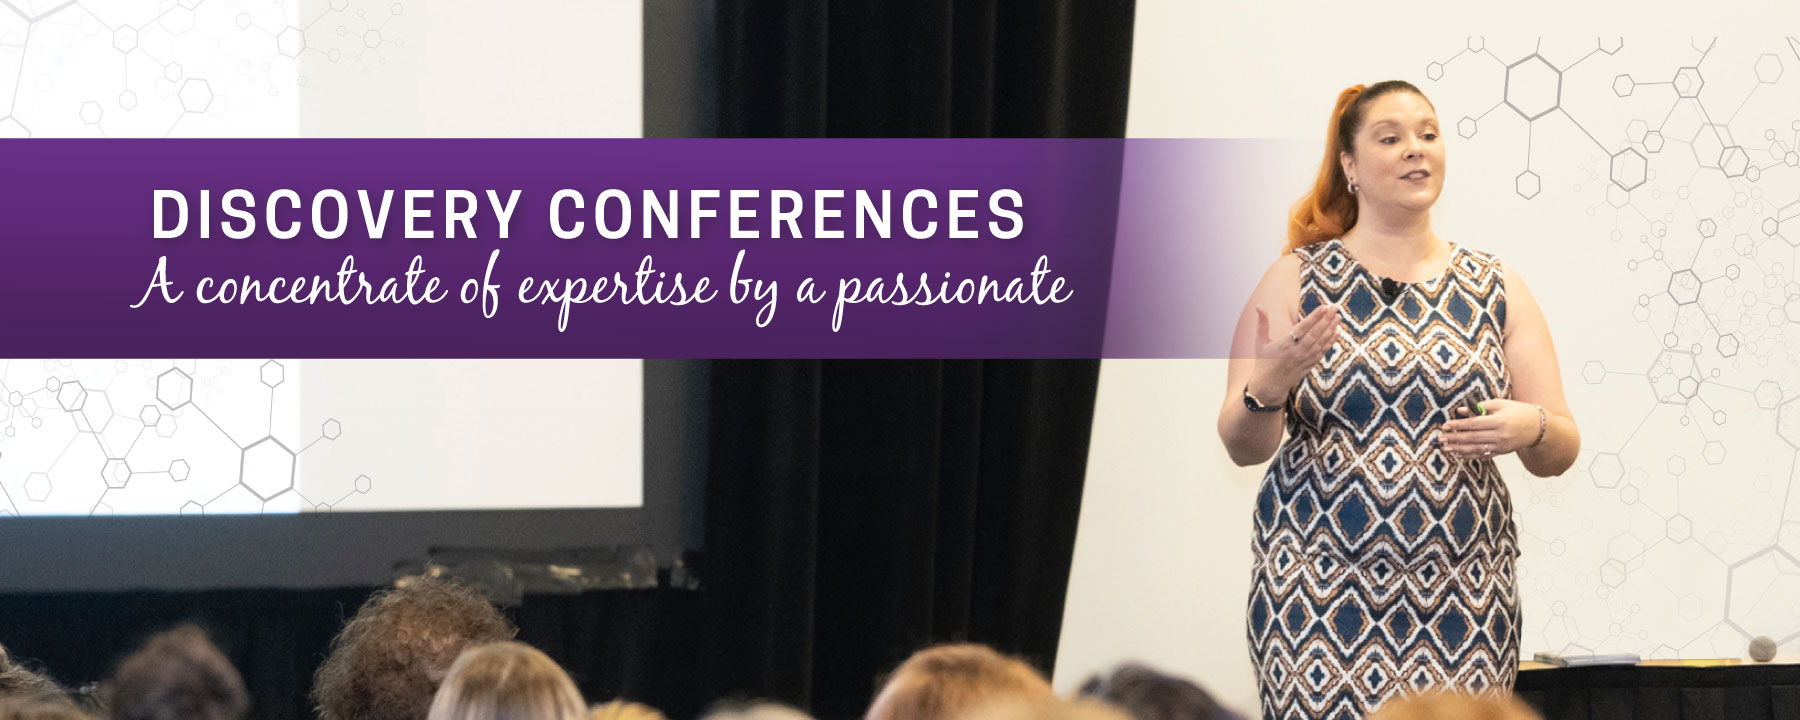 BandeauWeb-Conferencesvirtuelles-ANG